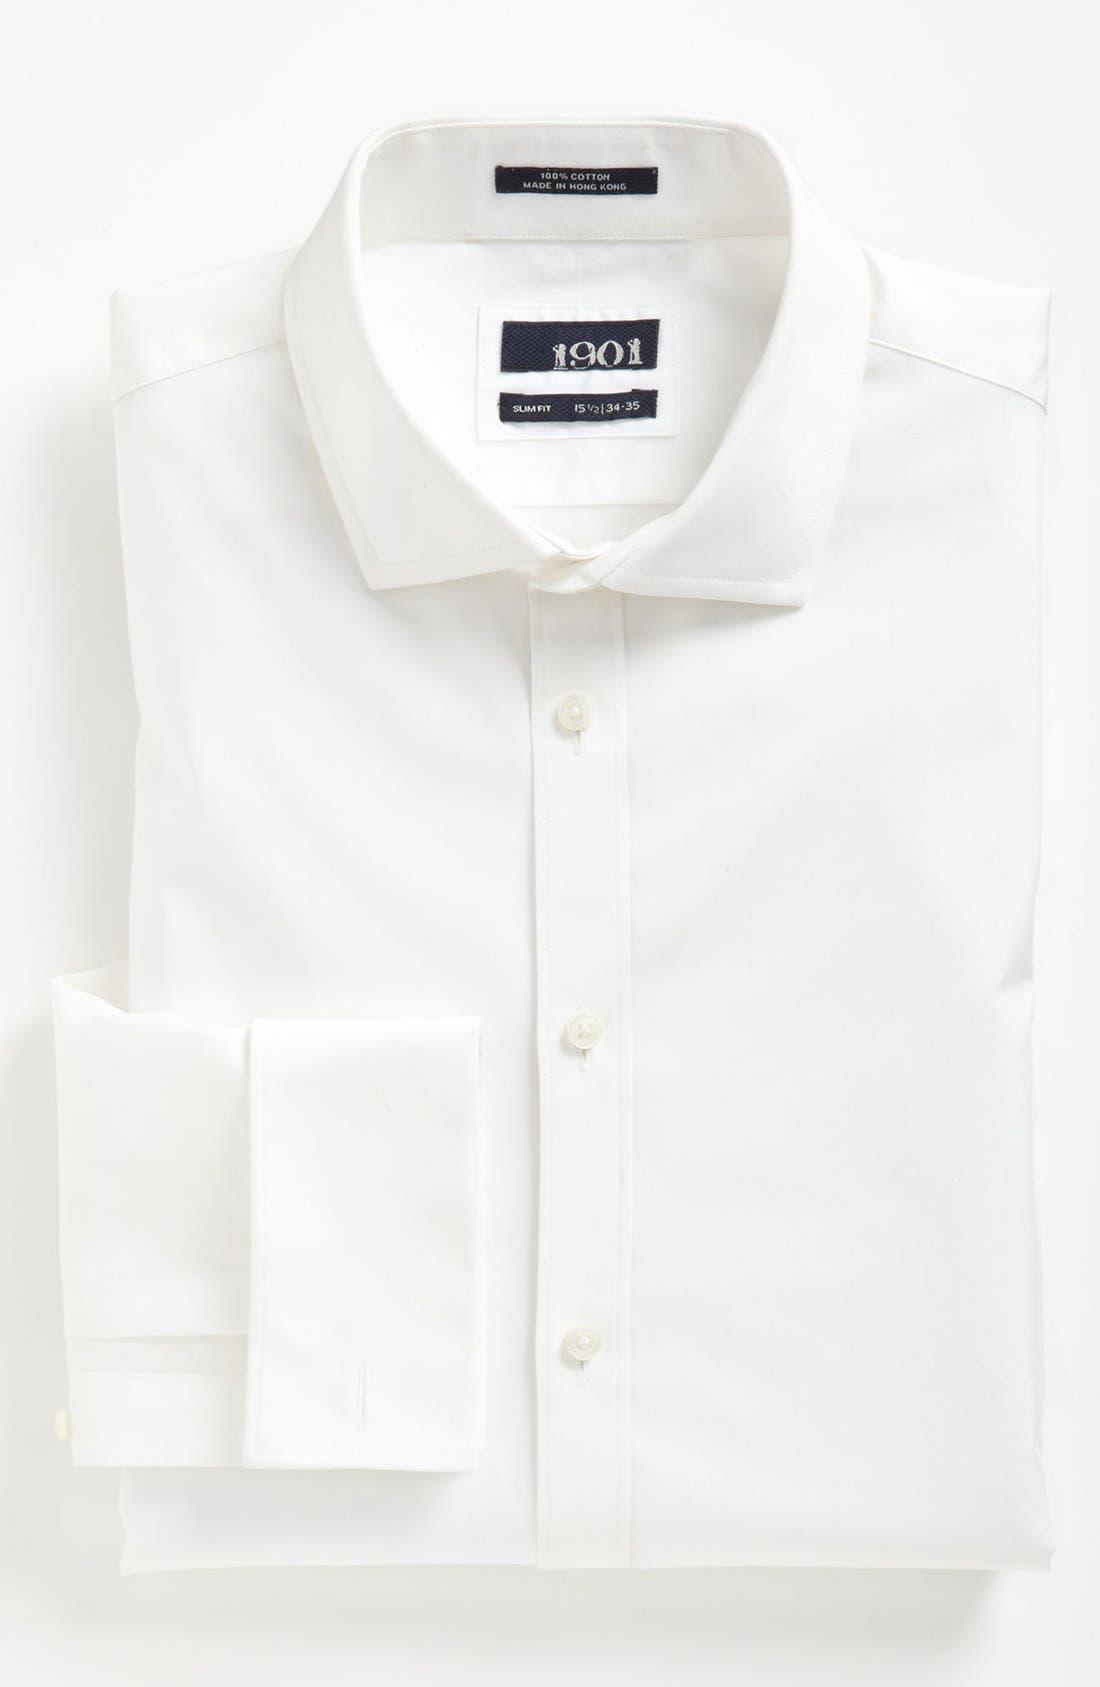 Alternate Image 1 Selected - 1901 Dress Shirt & Gitman Tie